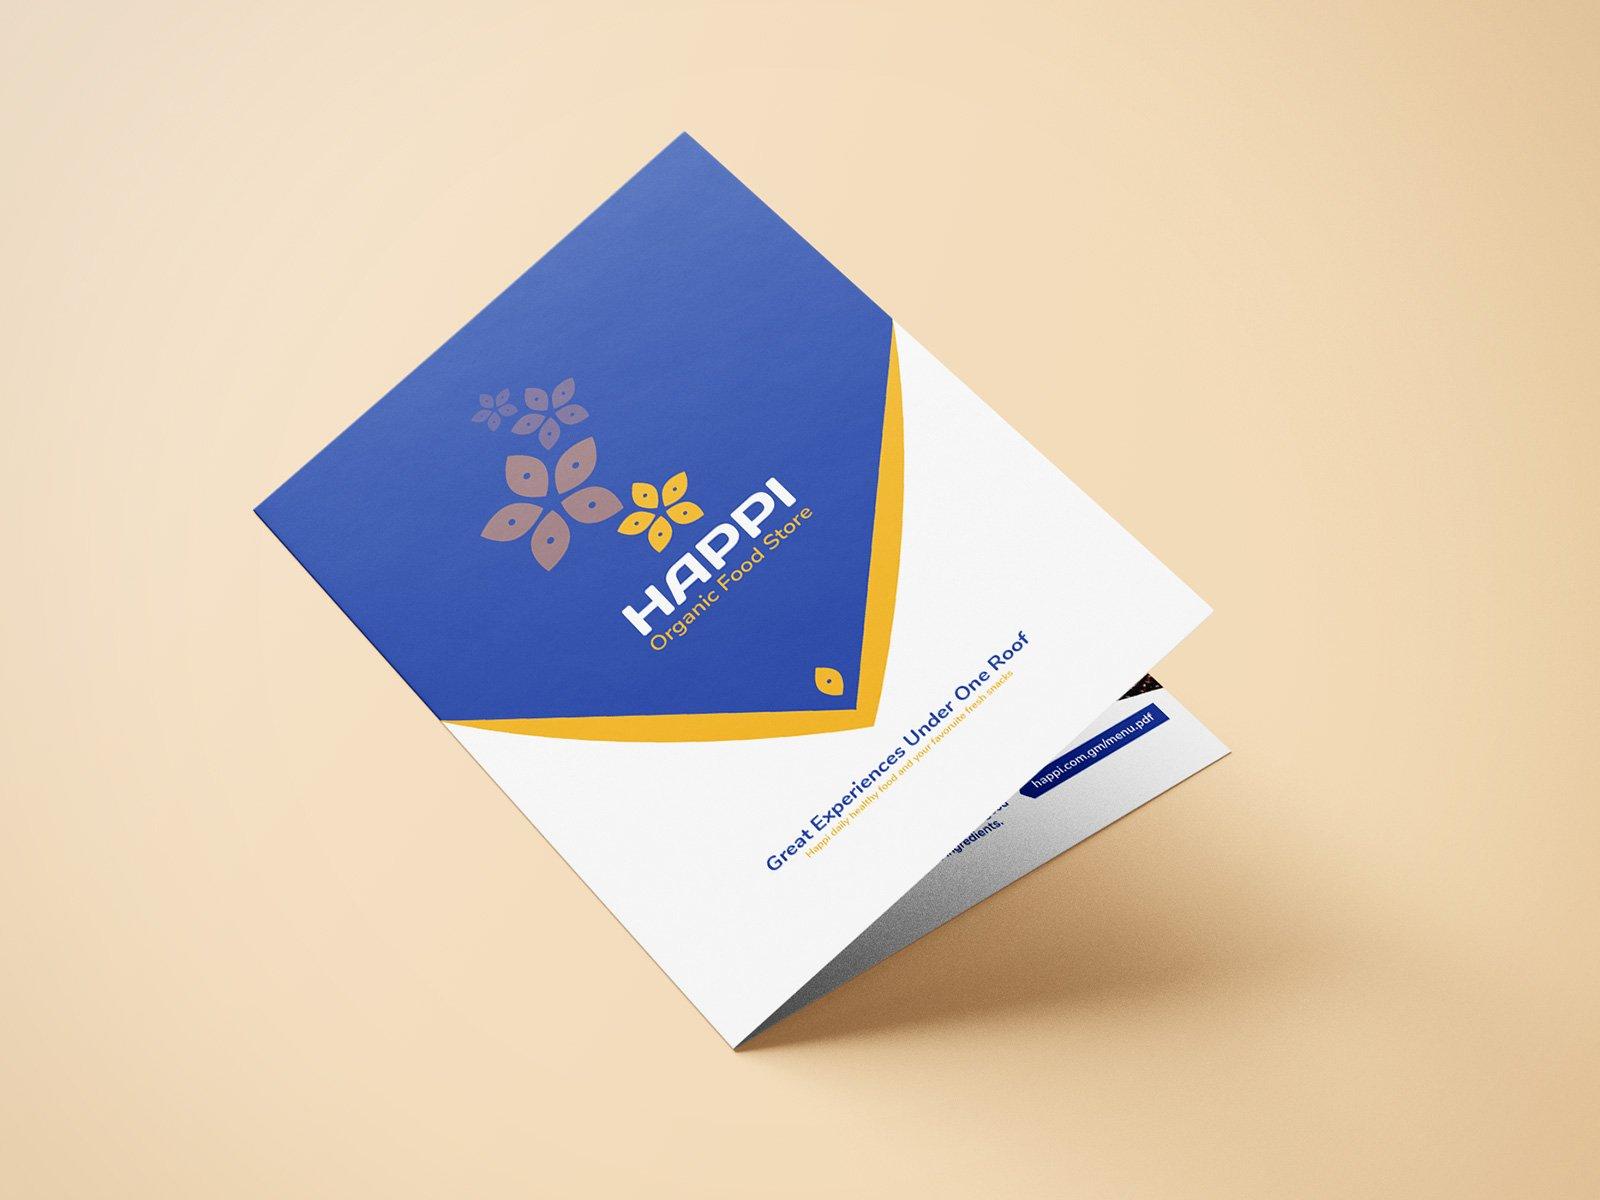 Free-Food-Company-Brochure-Design-Template-03